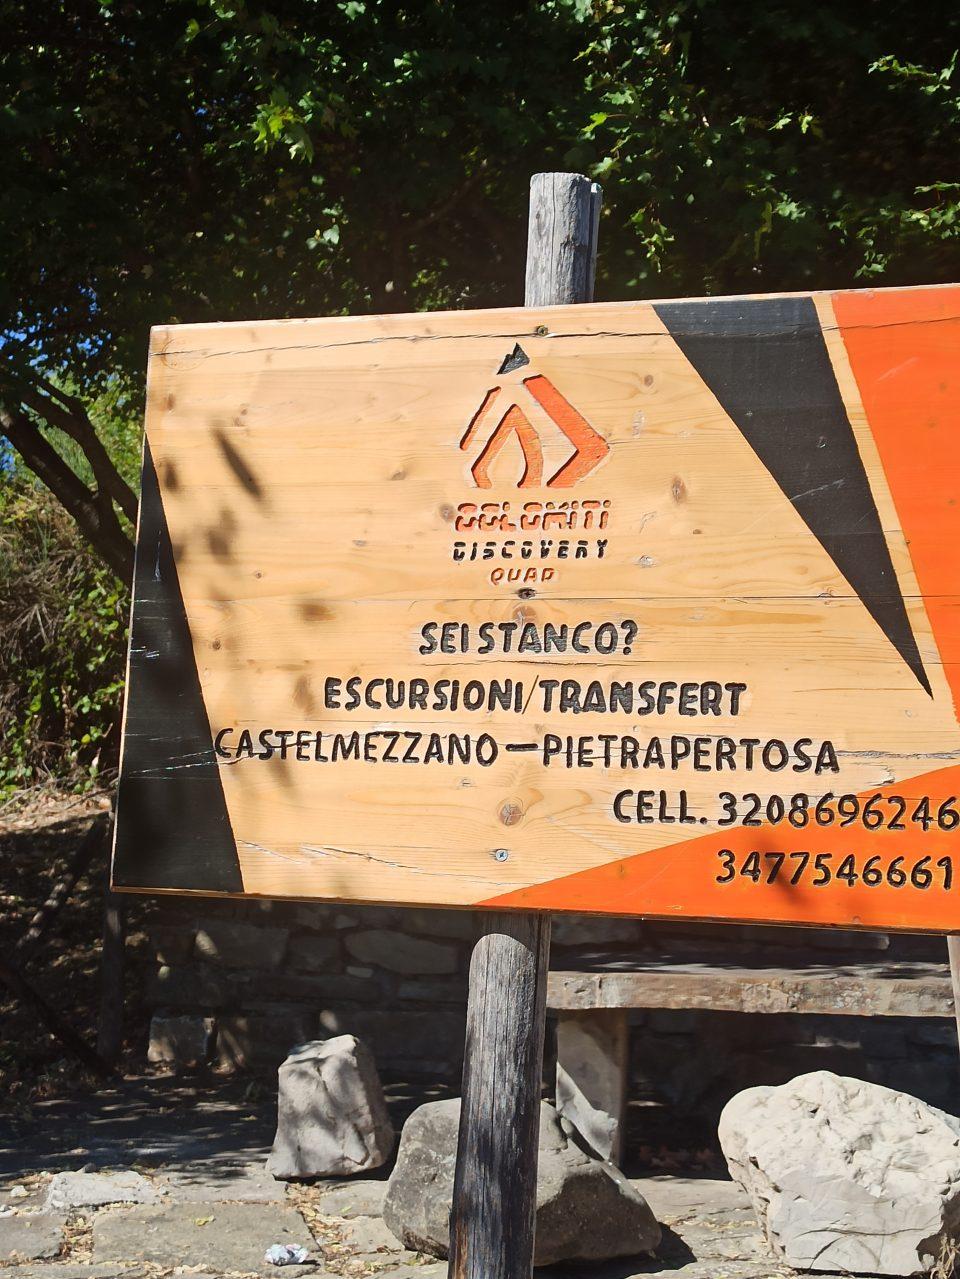 Transfert, Castelmezzano-Pietrapertosa @poshbackpackers